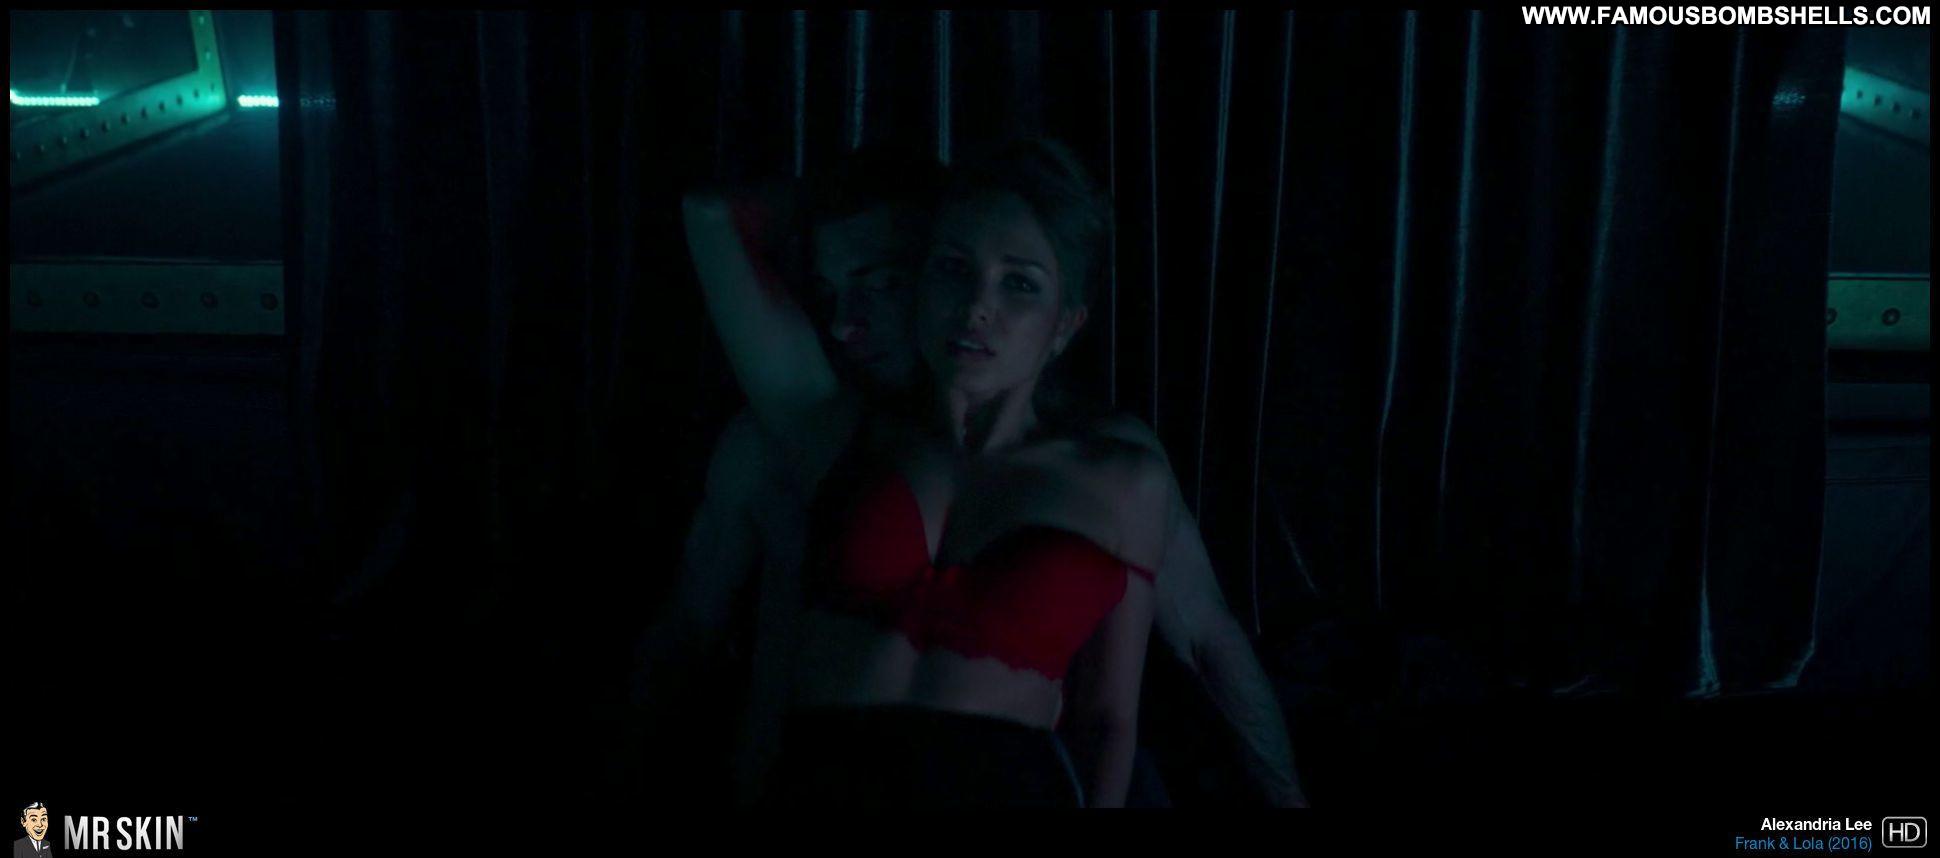 Alexandria Lee Franklola Celebrity Blonde Medium Tits Nice Gorgeous Sensual Posing Hot